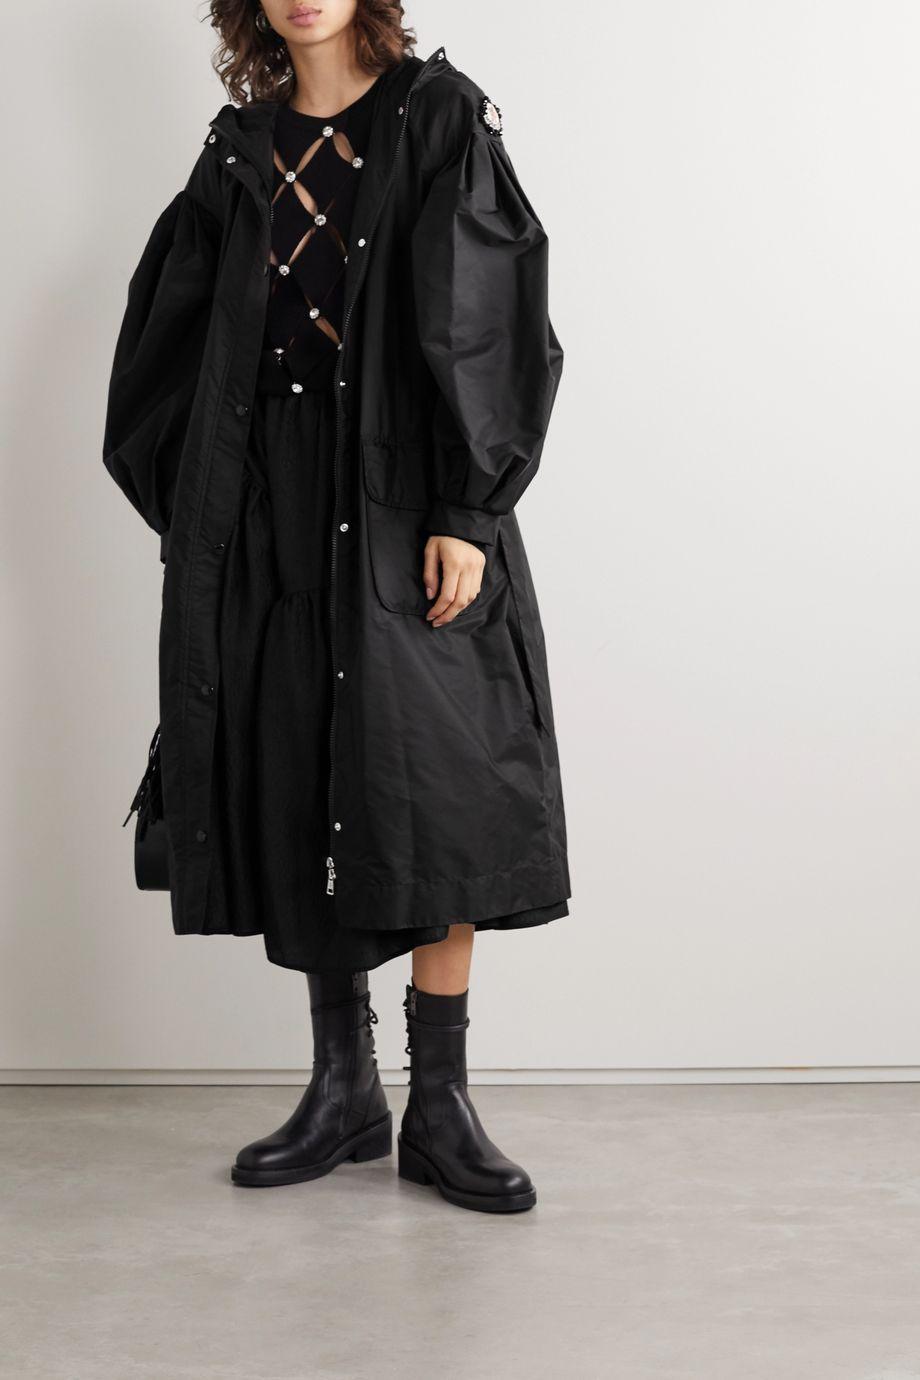 Moncler Genius + 4 Simone Rocha Eminia hooded embellished appliquéd shell coat